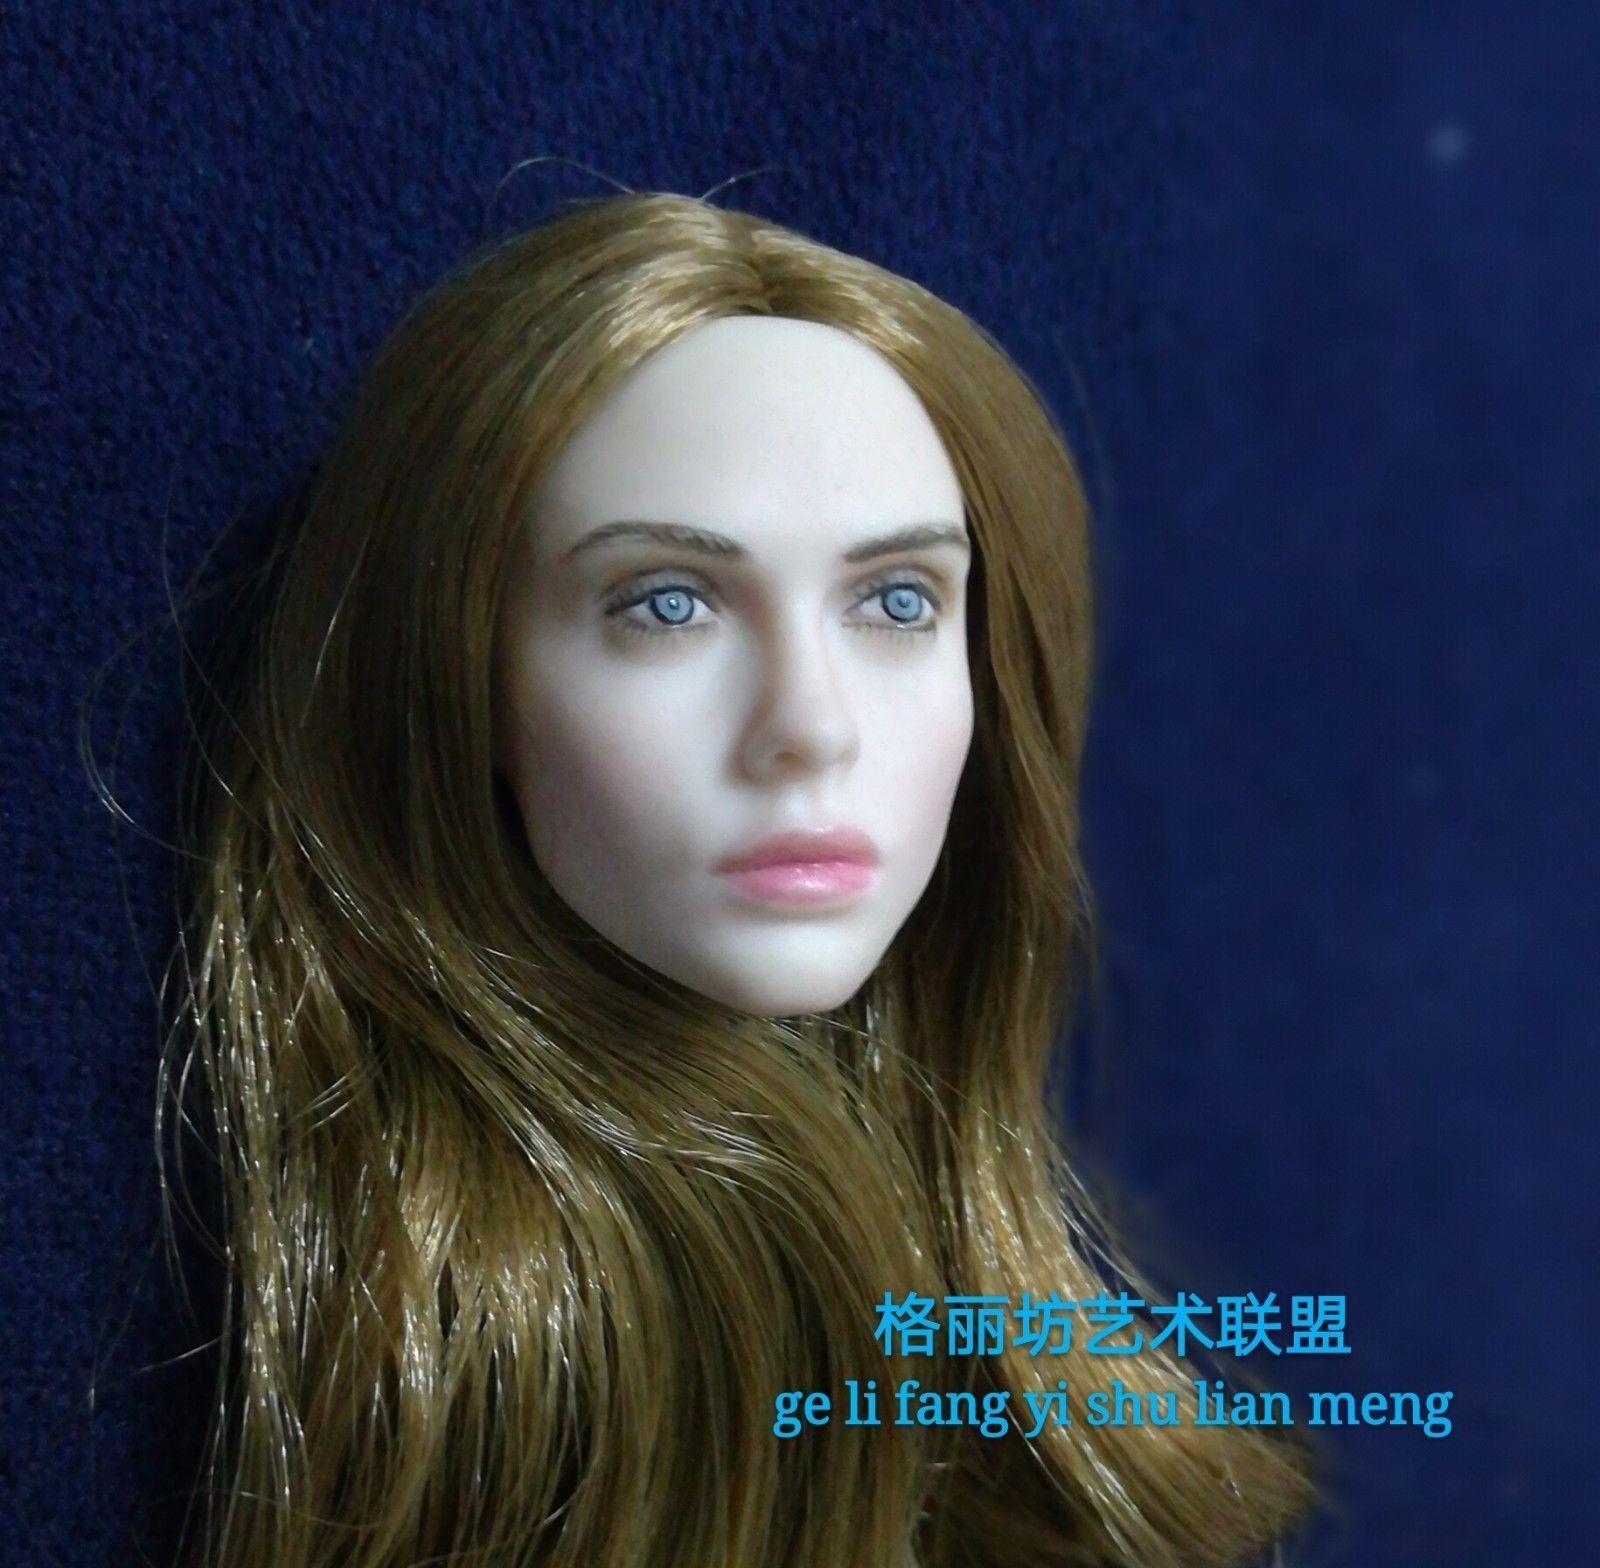 1 6 Scale Villa Coffee Hair Head Model For 12  Female Pale Figure Body